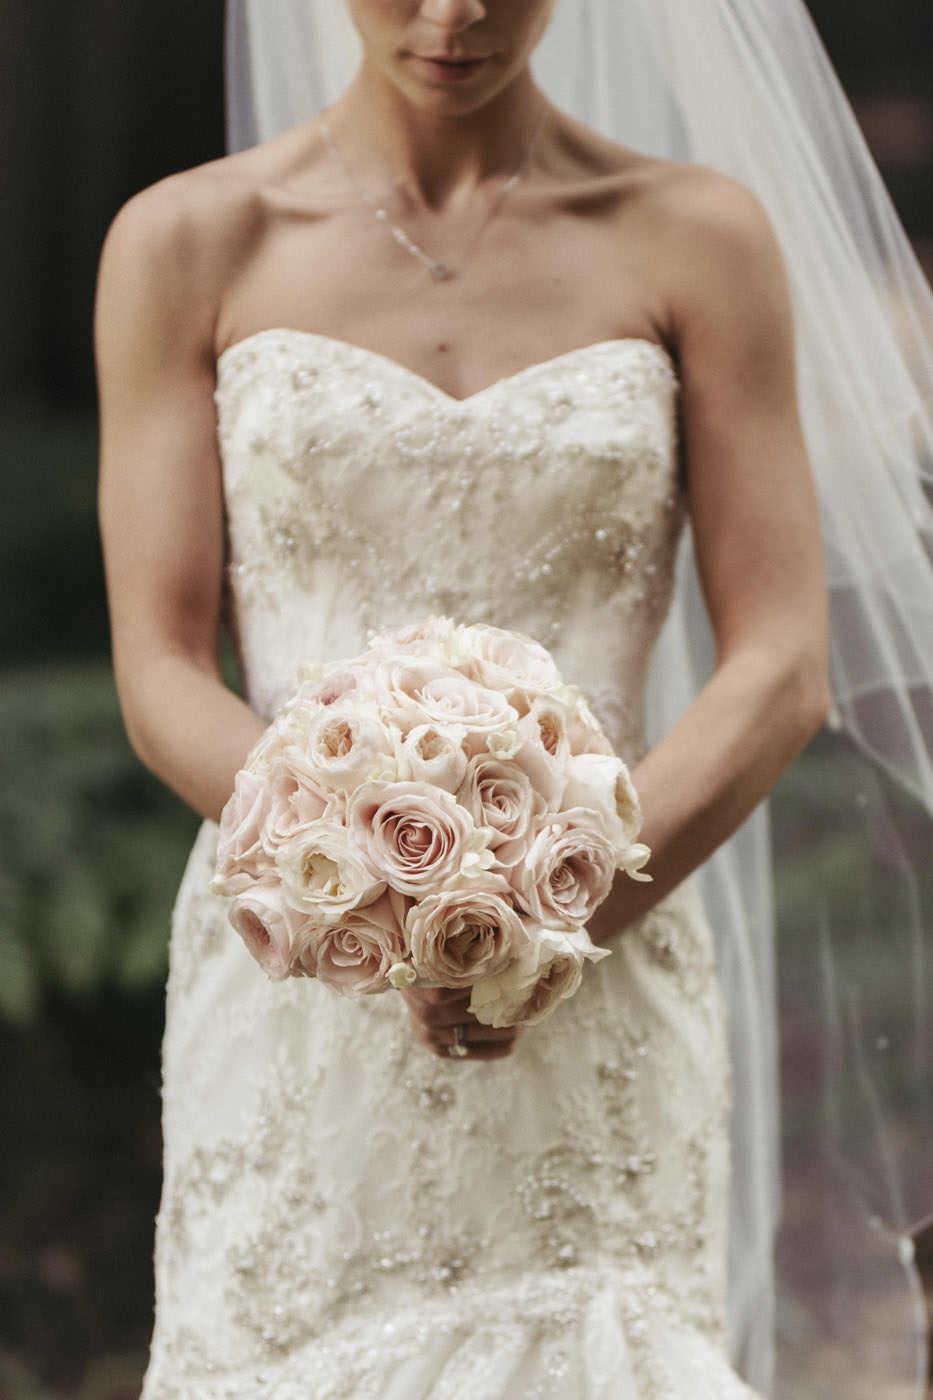 lukeemily foxhills wedding photographer 0078